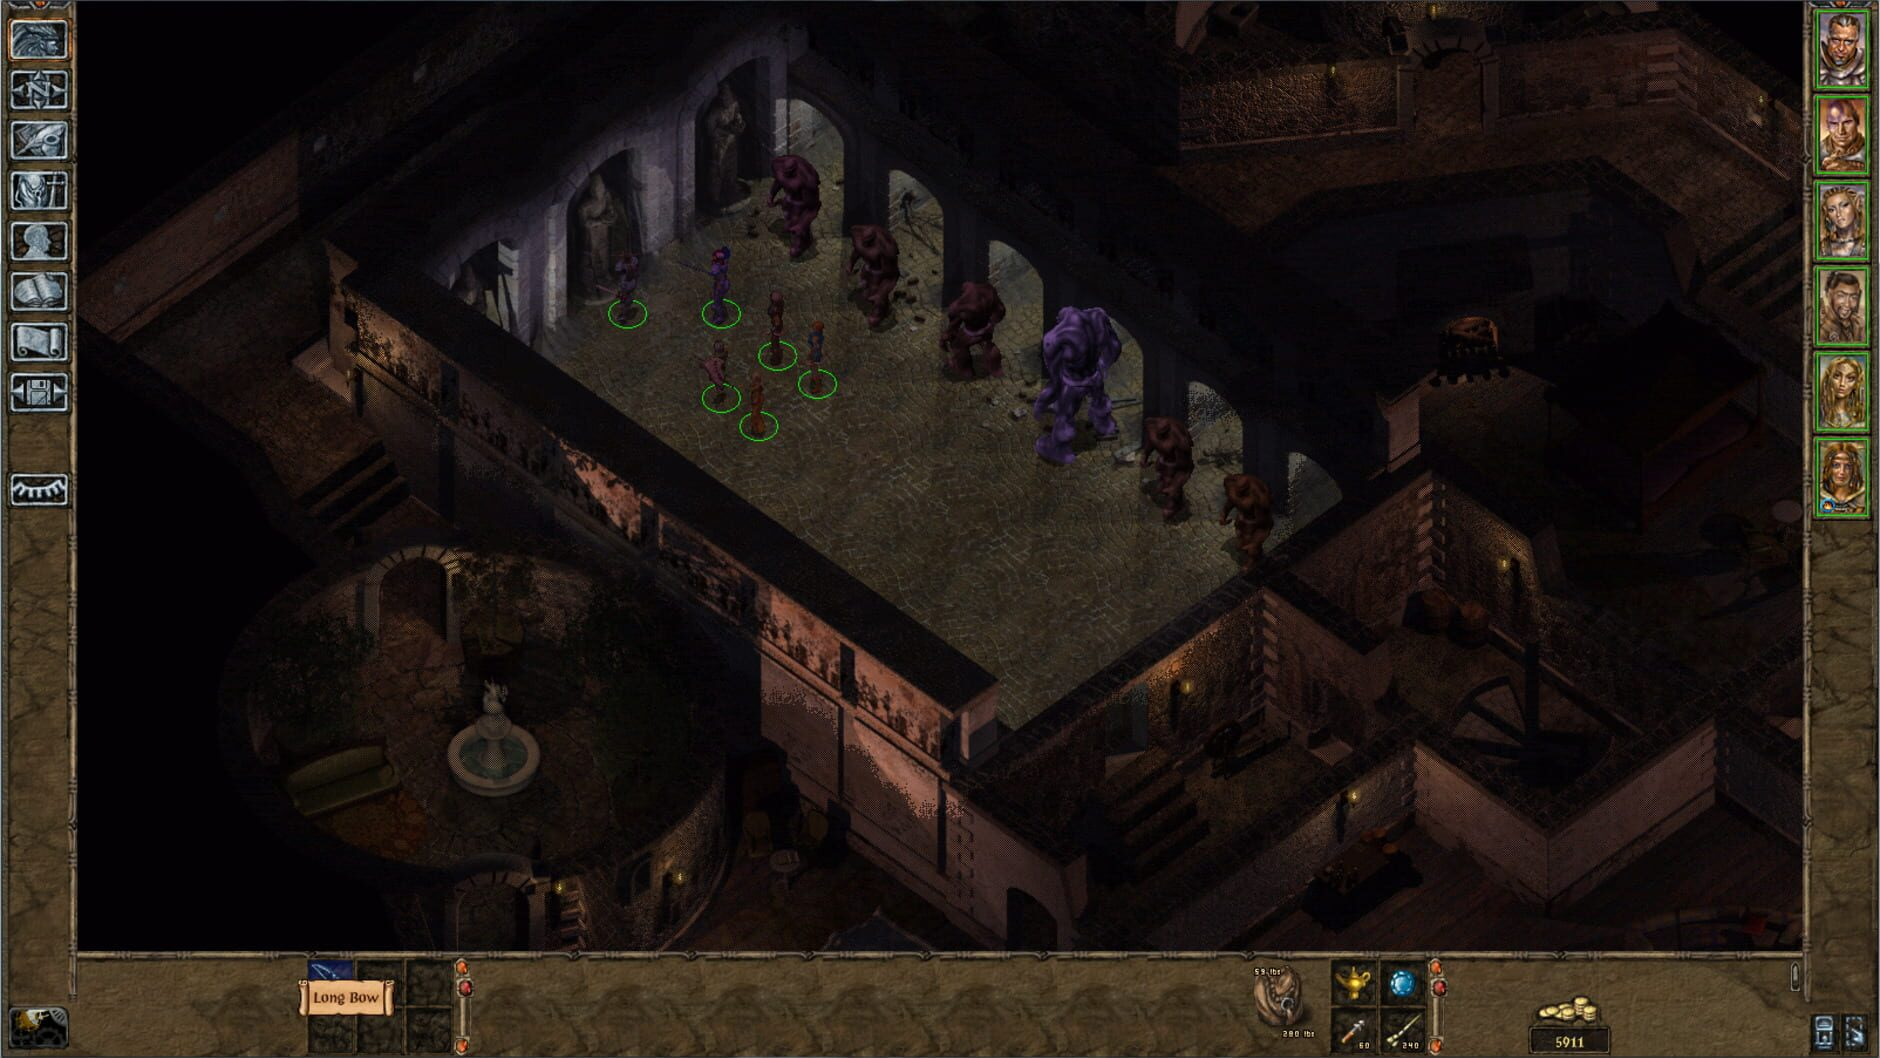 Baldur's Gate II: Shadows Of Amn - 0